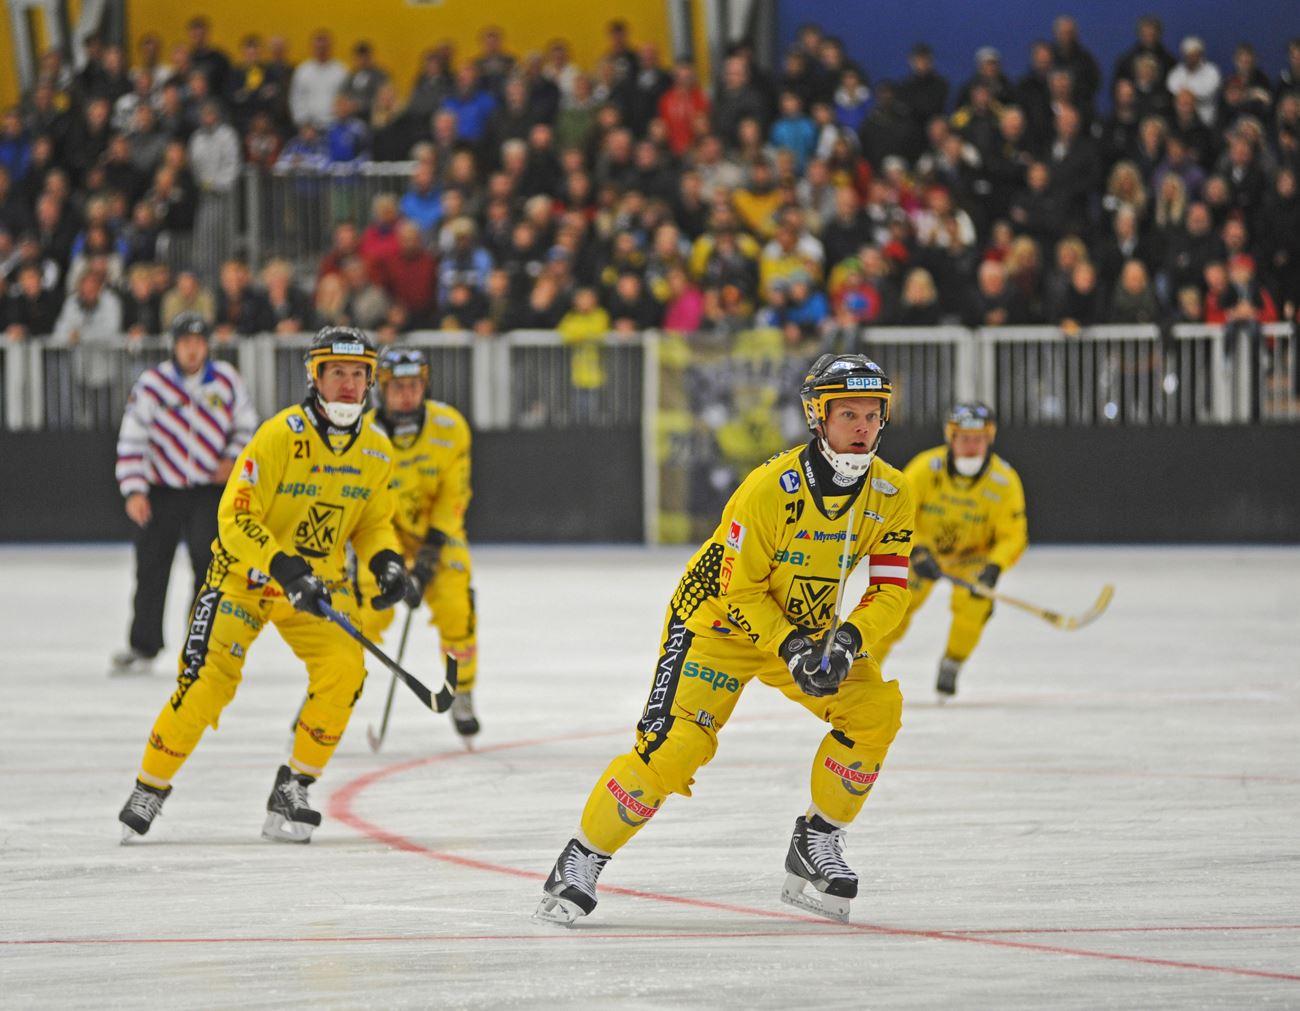 © Vetlanda Turistbyrå, Sapa Arena - VBK